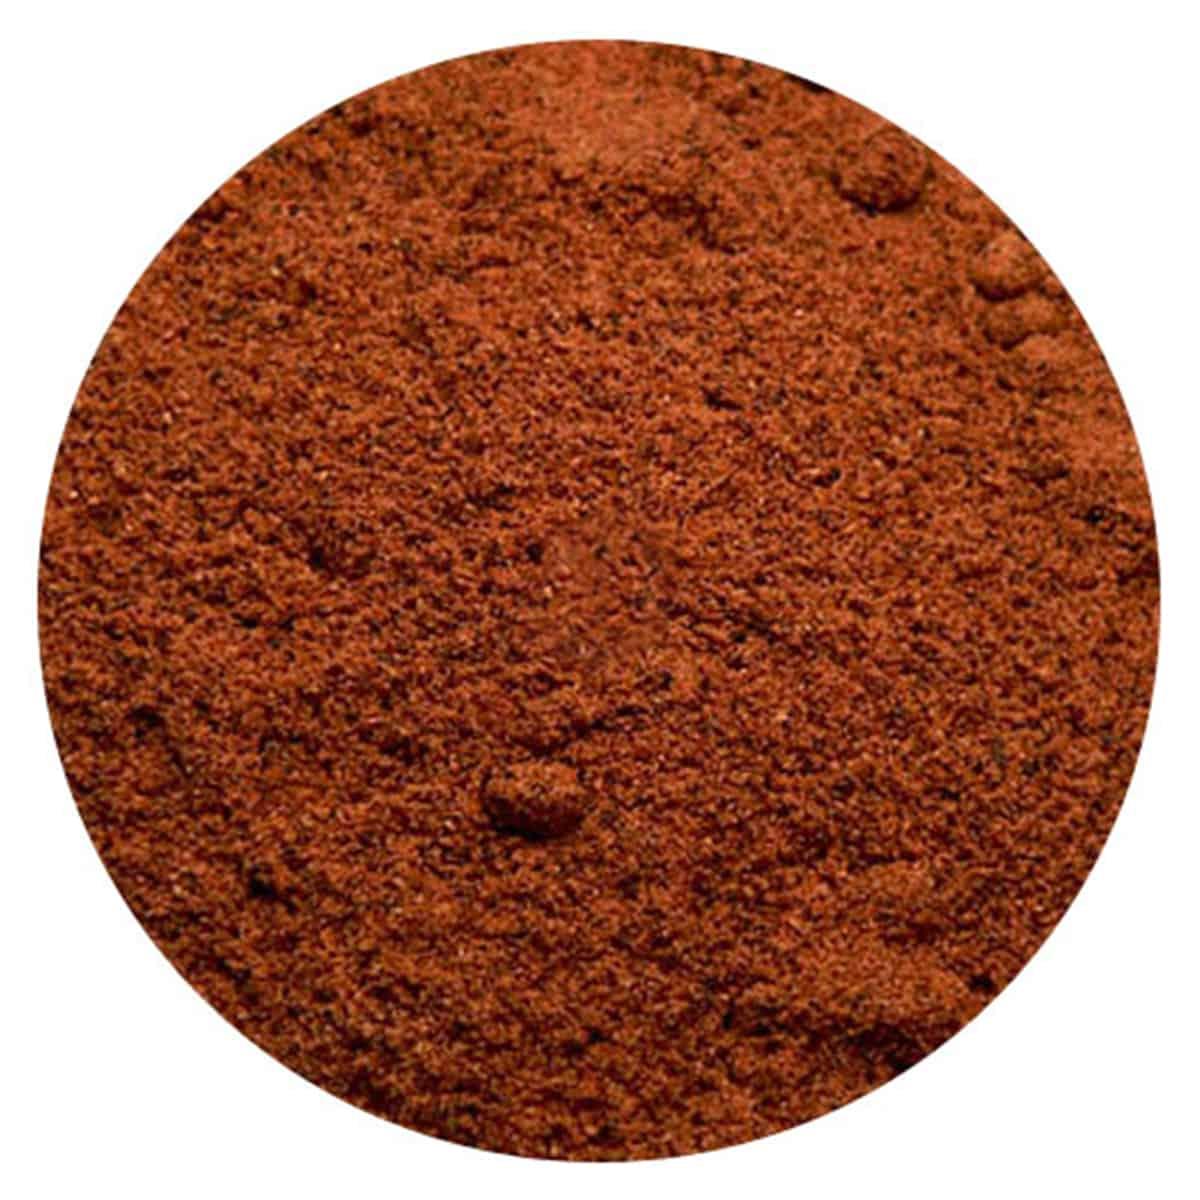 Buy IAG Foods Nutmeg Powder - 1 kg